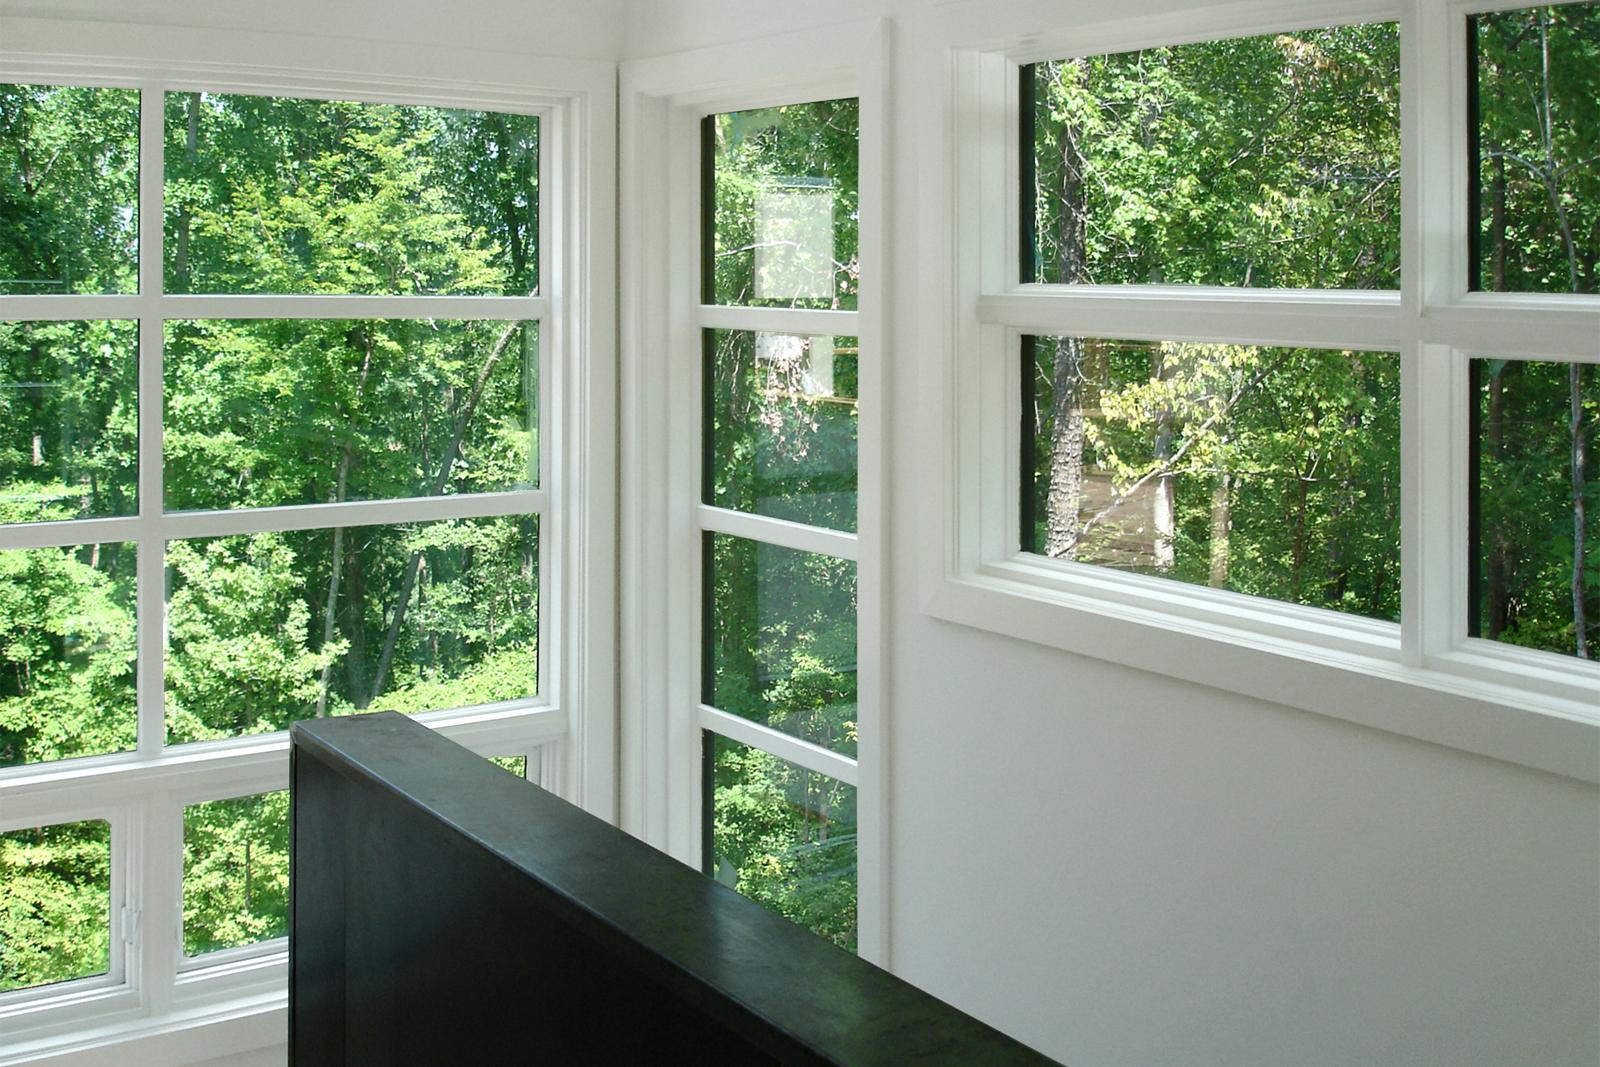 13-architecture-modern-modular-house-prefab-dwell-home-interior-stair-hall.jpg